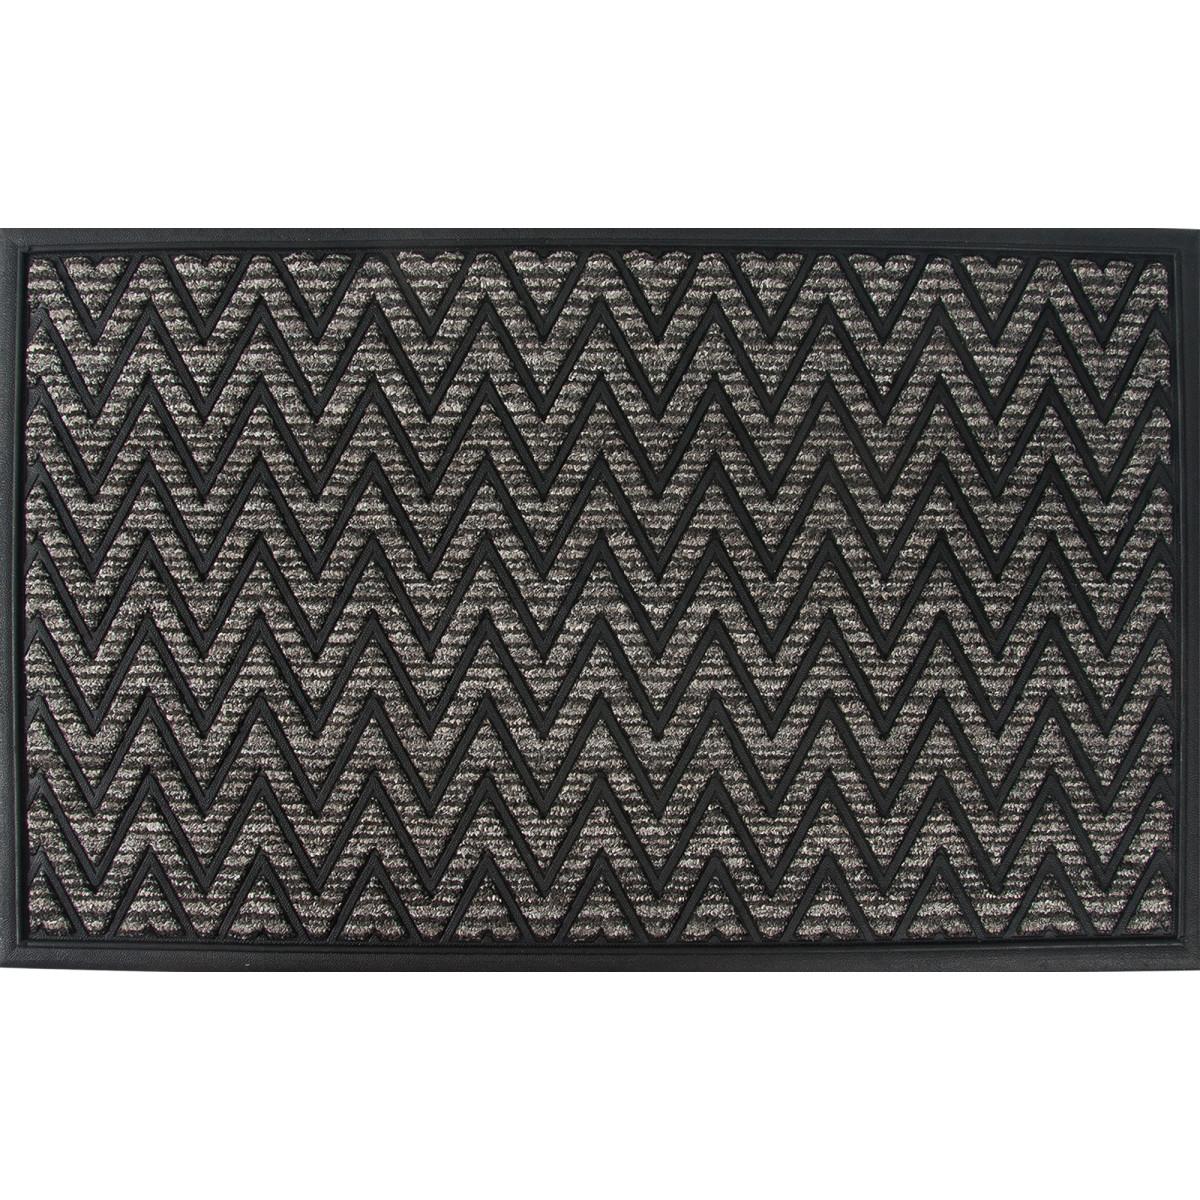 Коврик Porto 1050 45x75 см резина цвет серый